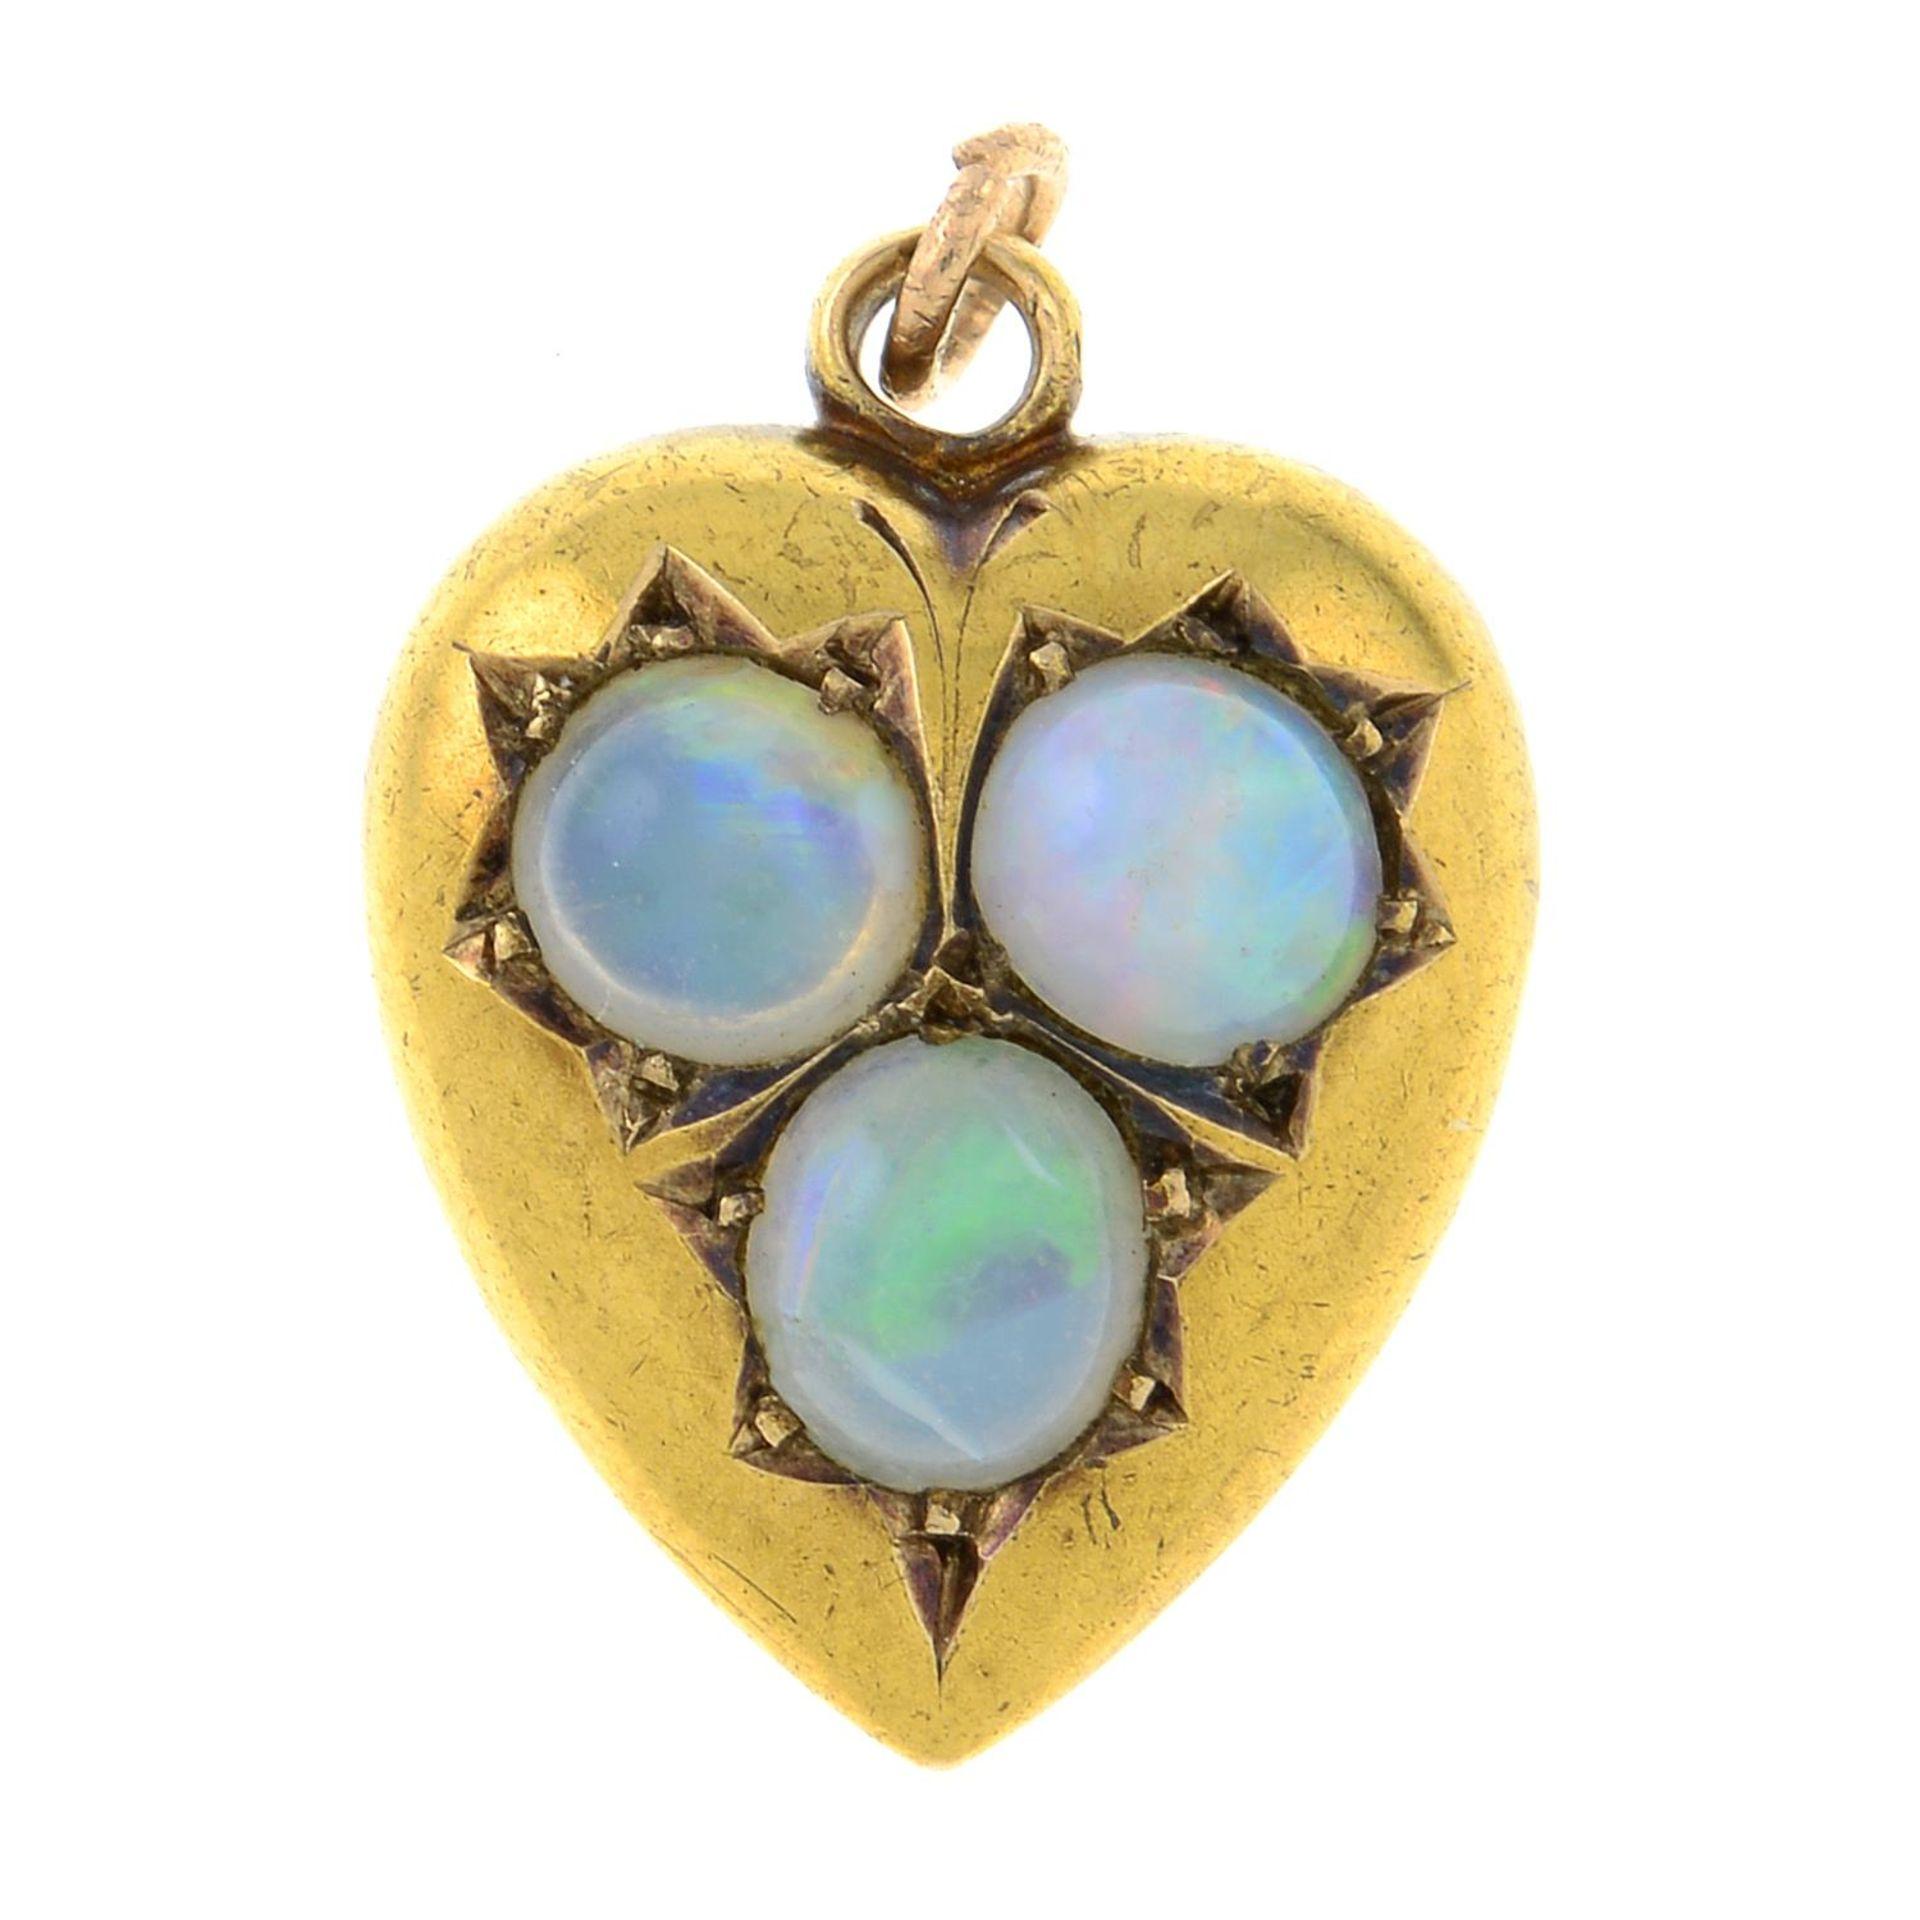 An Edwardian 15ct gold opal heart pendant.Hallmarks for Chester, 1905.